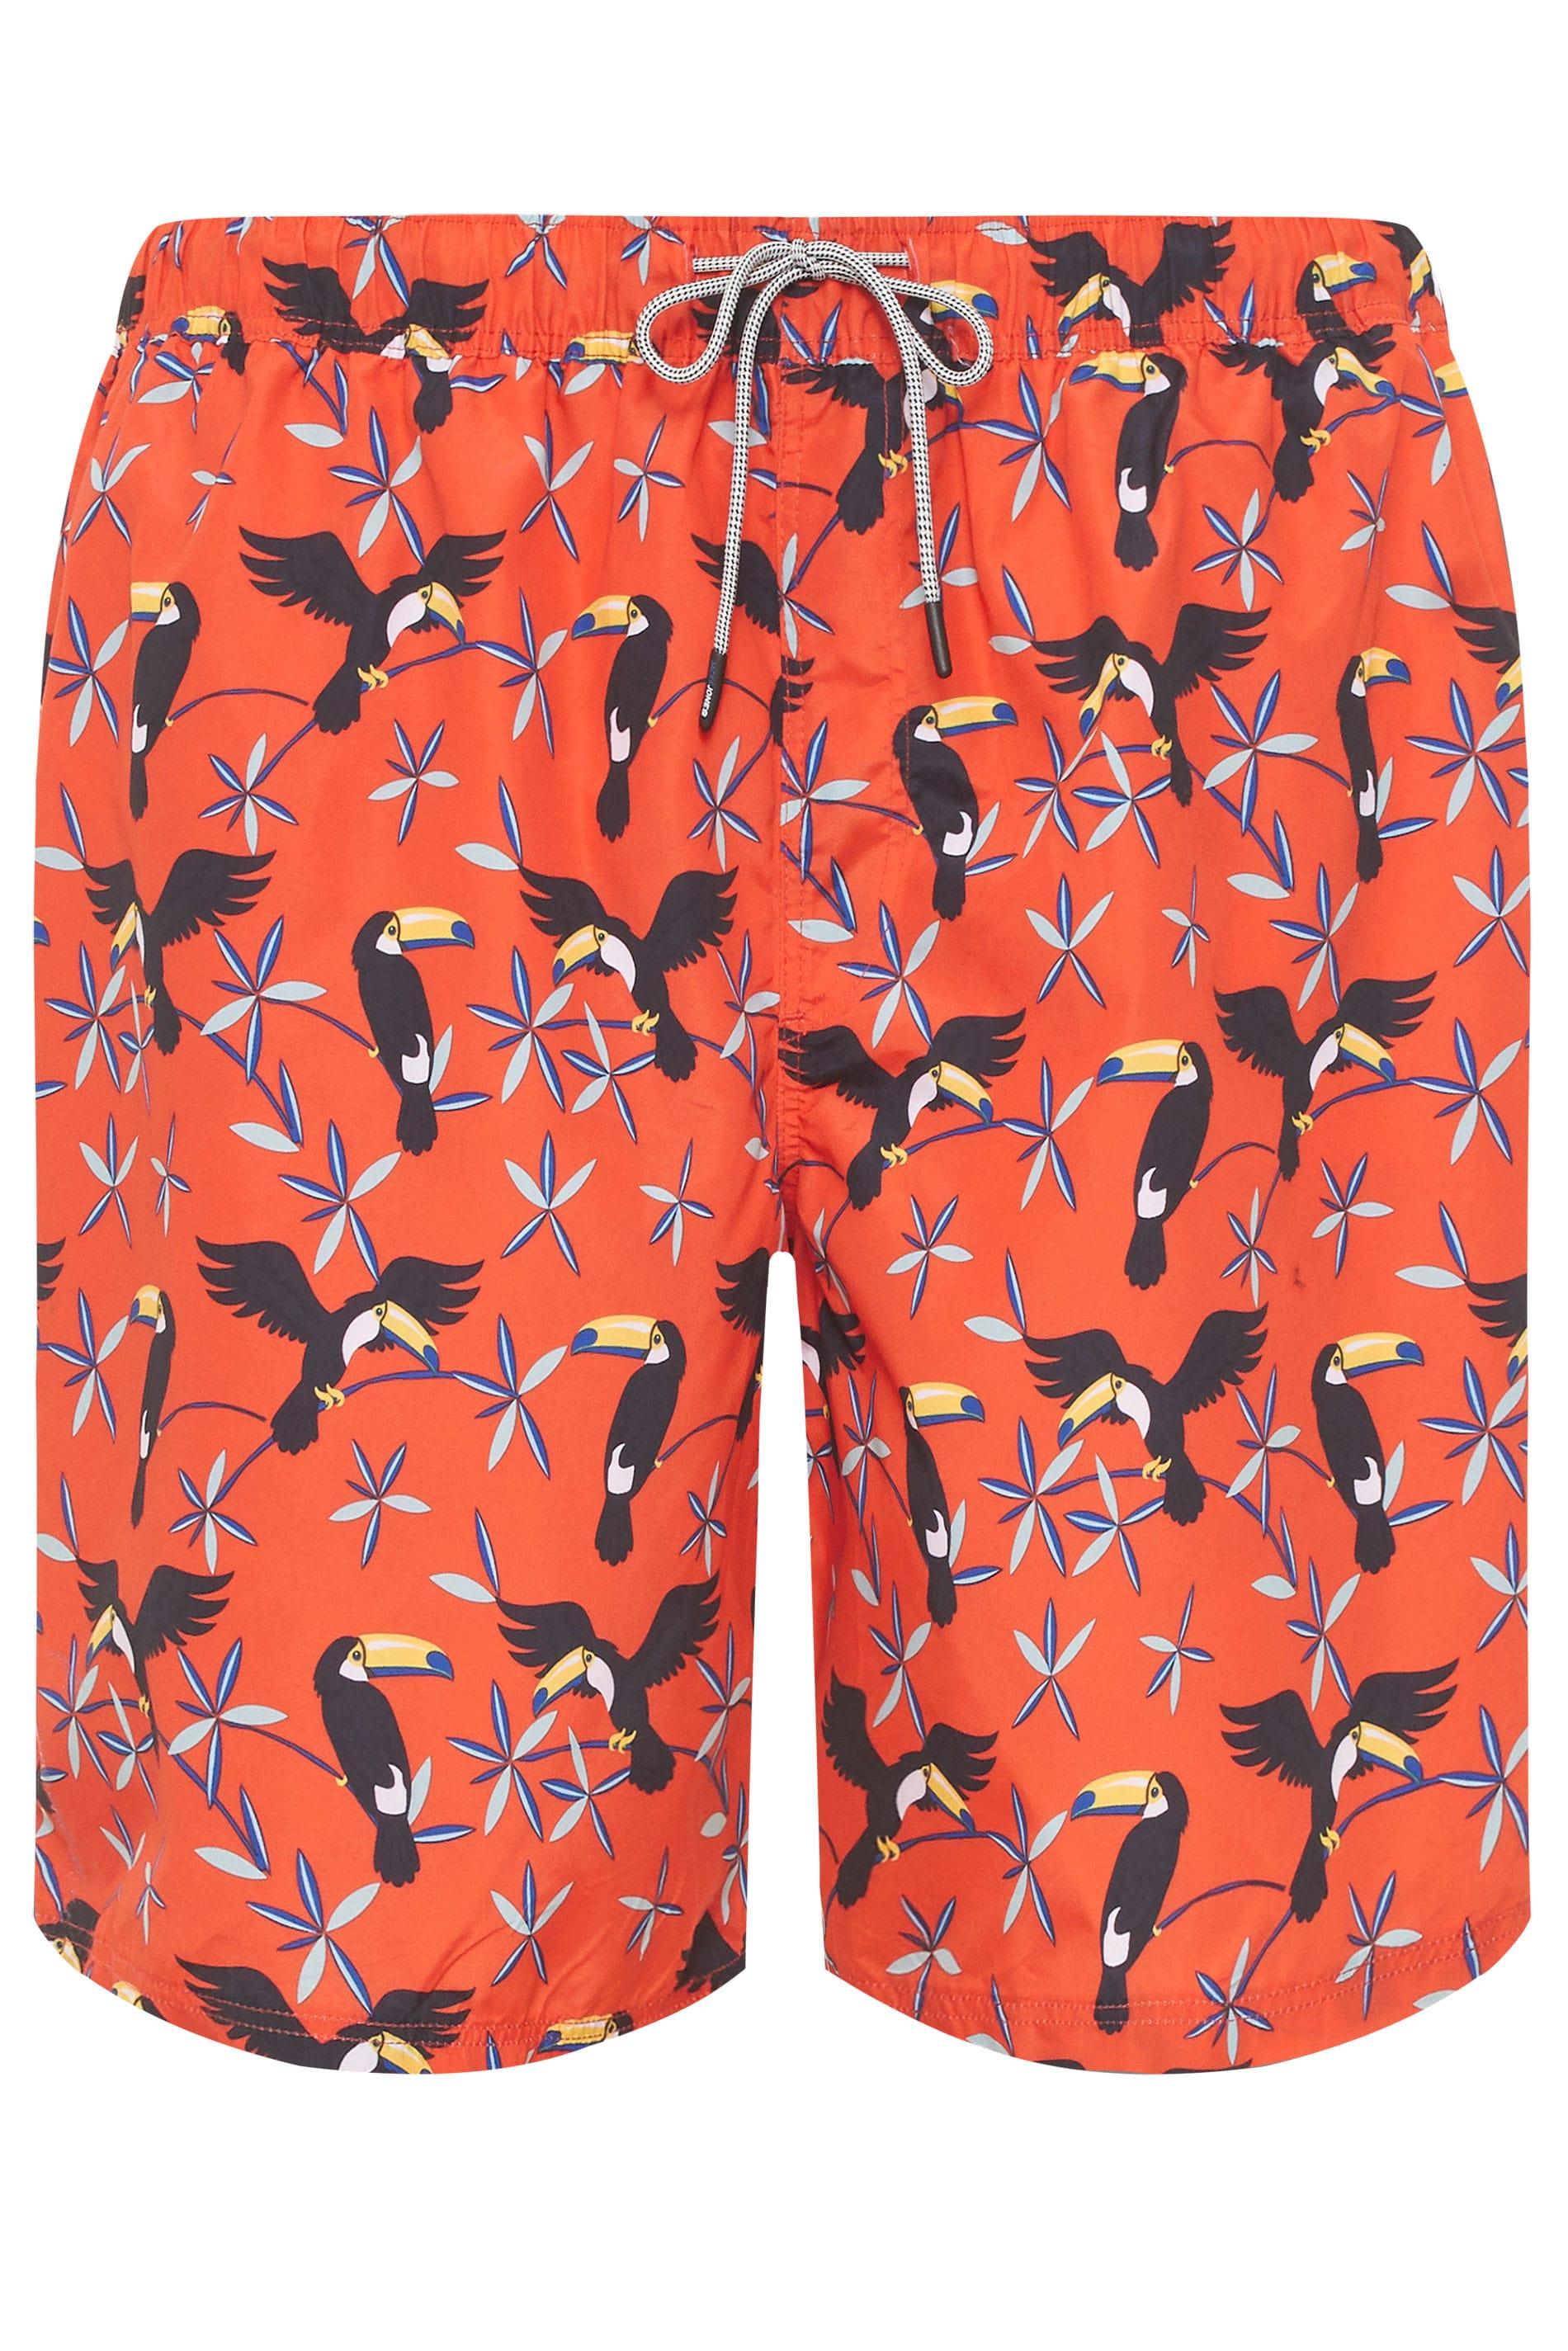 JACK & JONES Orange Bird Print Swim Shorts